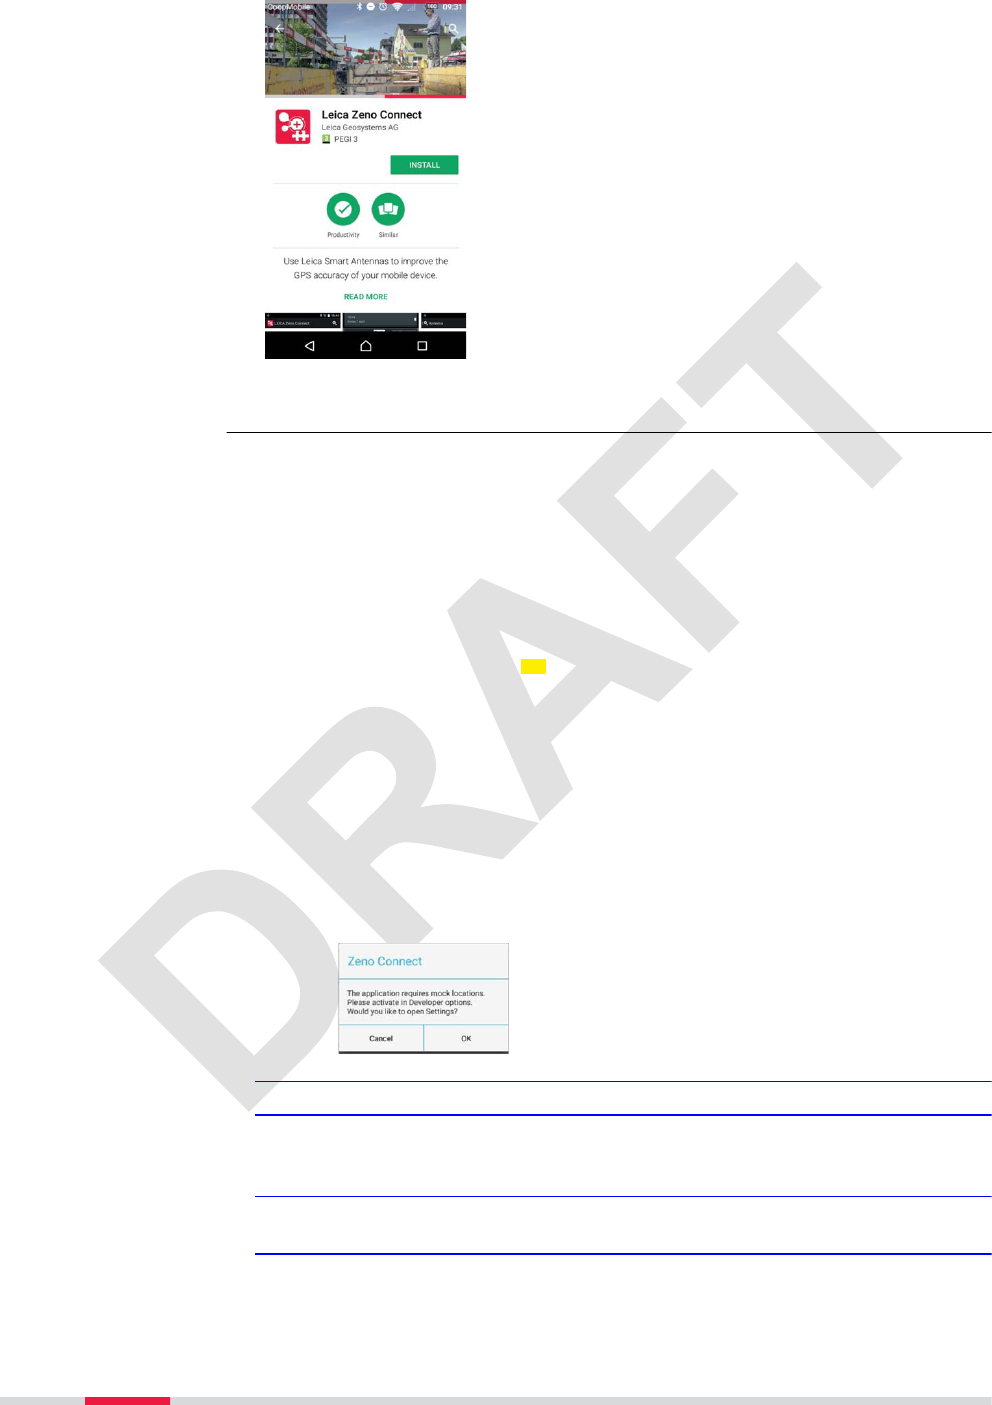 Leica Geosystems Sagg04p Smart Antenna User Manual Rfd Userman Antennas 015191 001